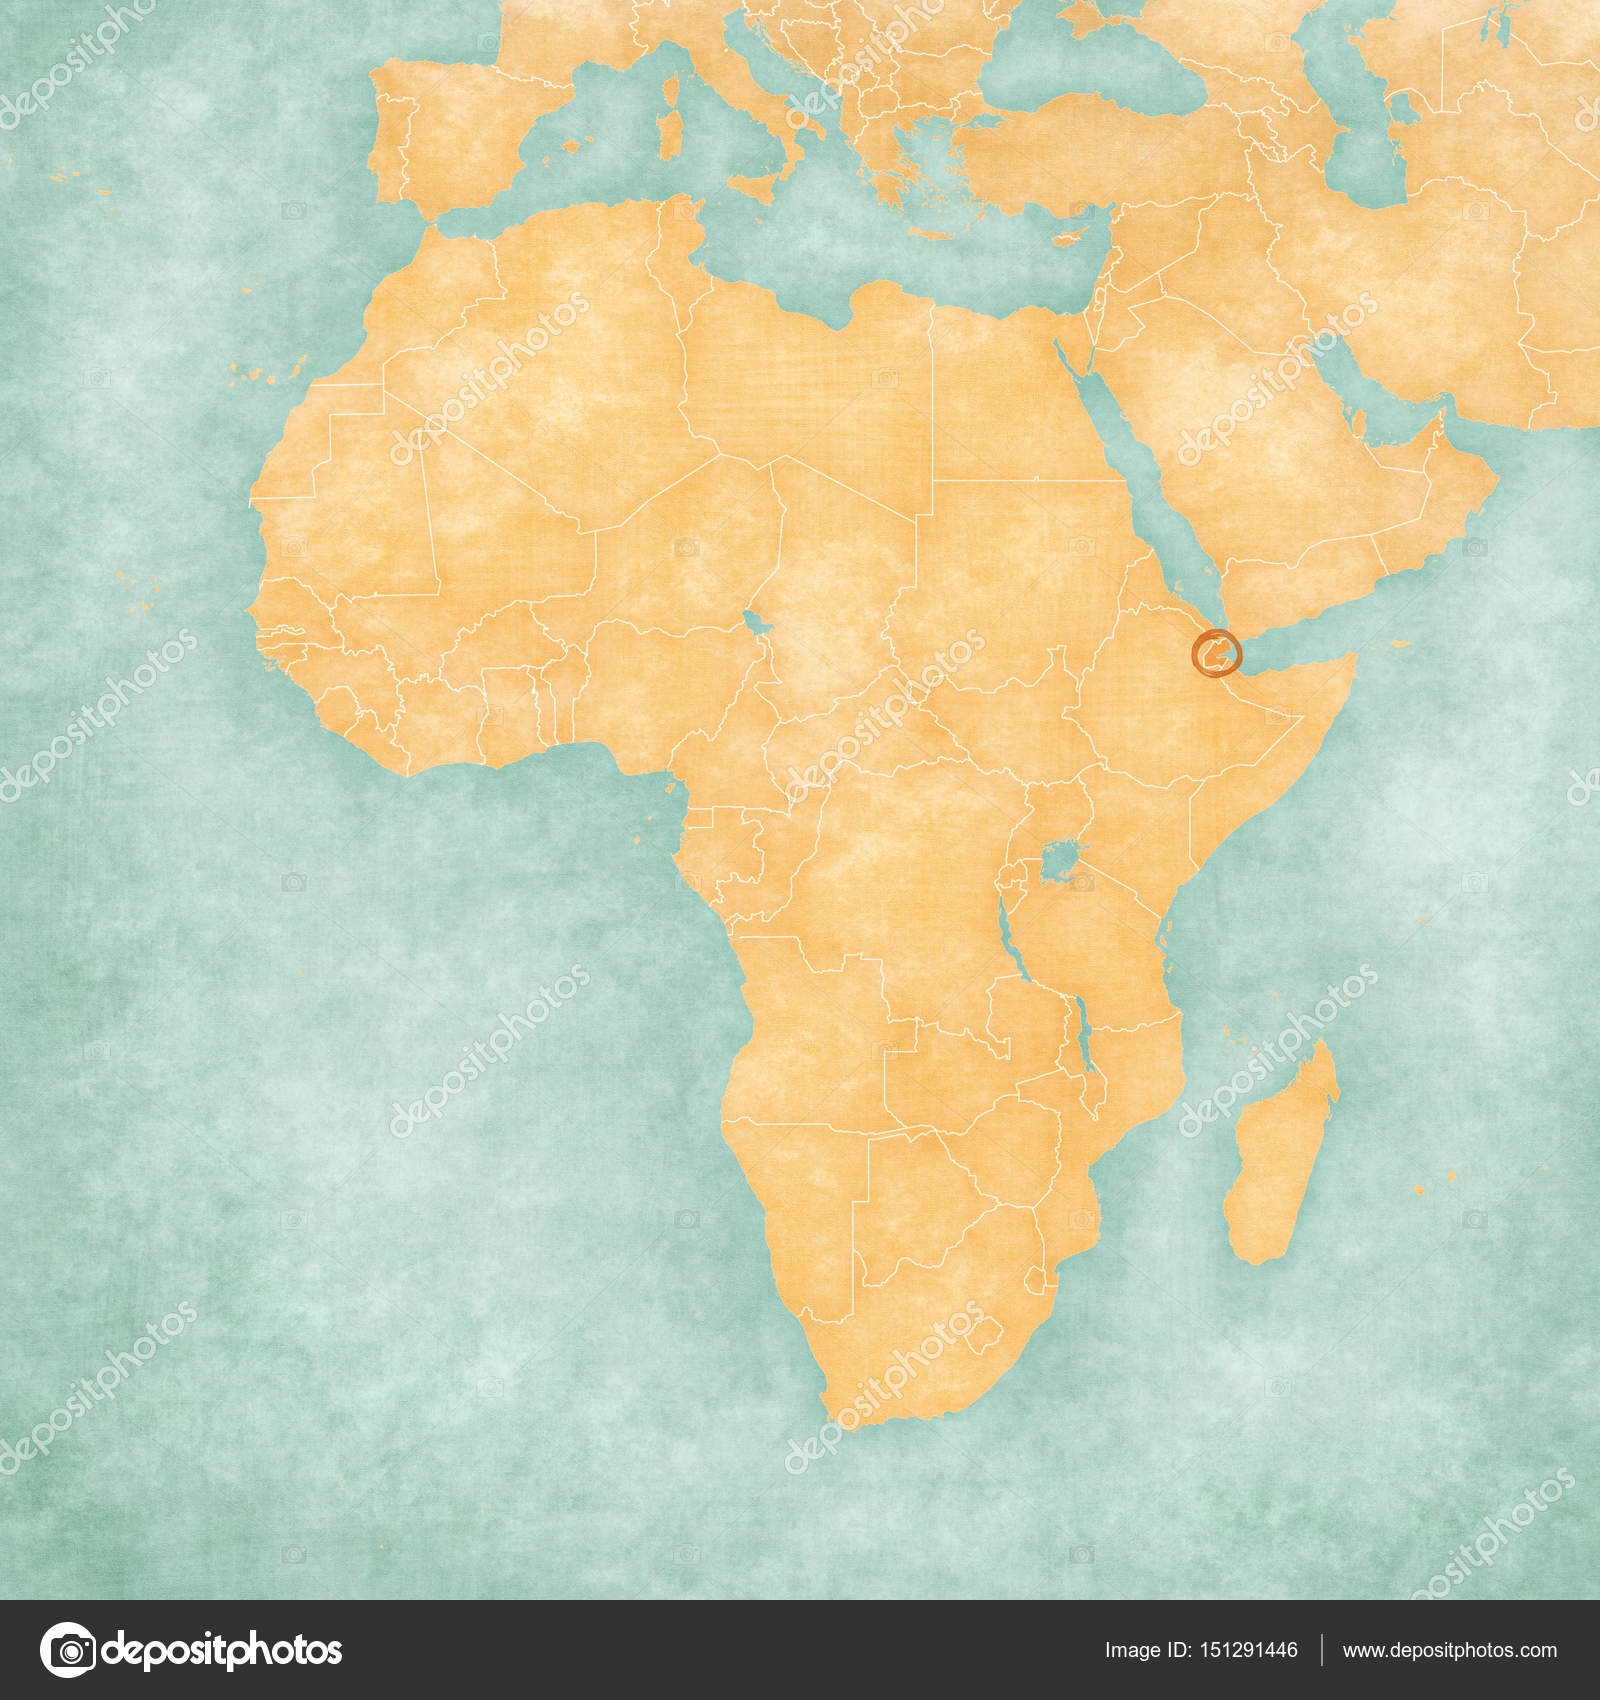 Map of Africa - Djibouti — Stock Photo © Tindo #151291446